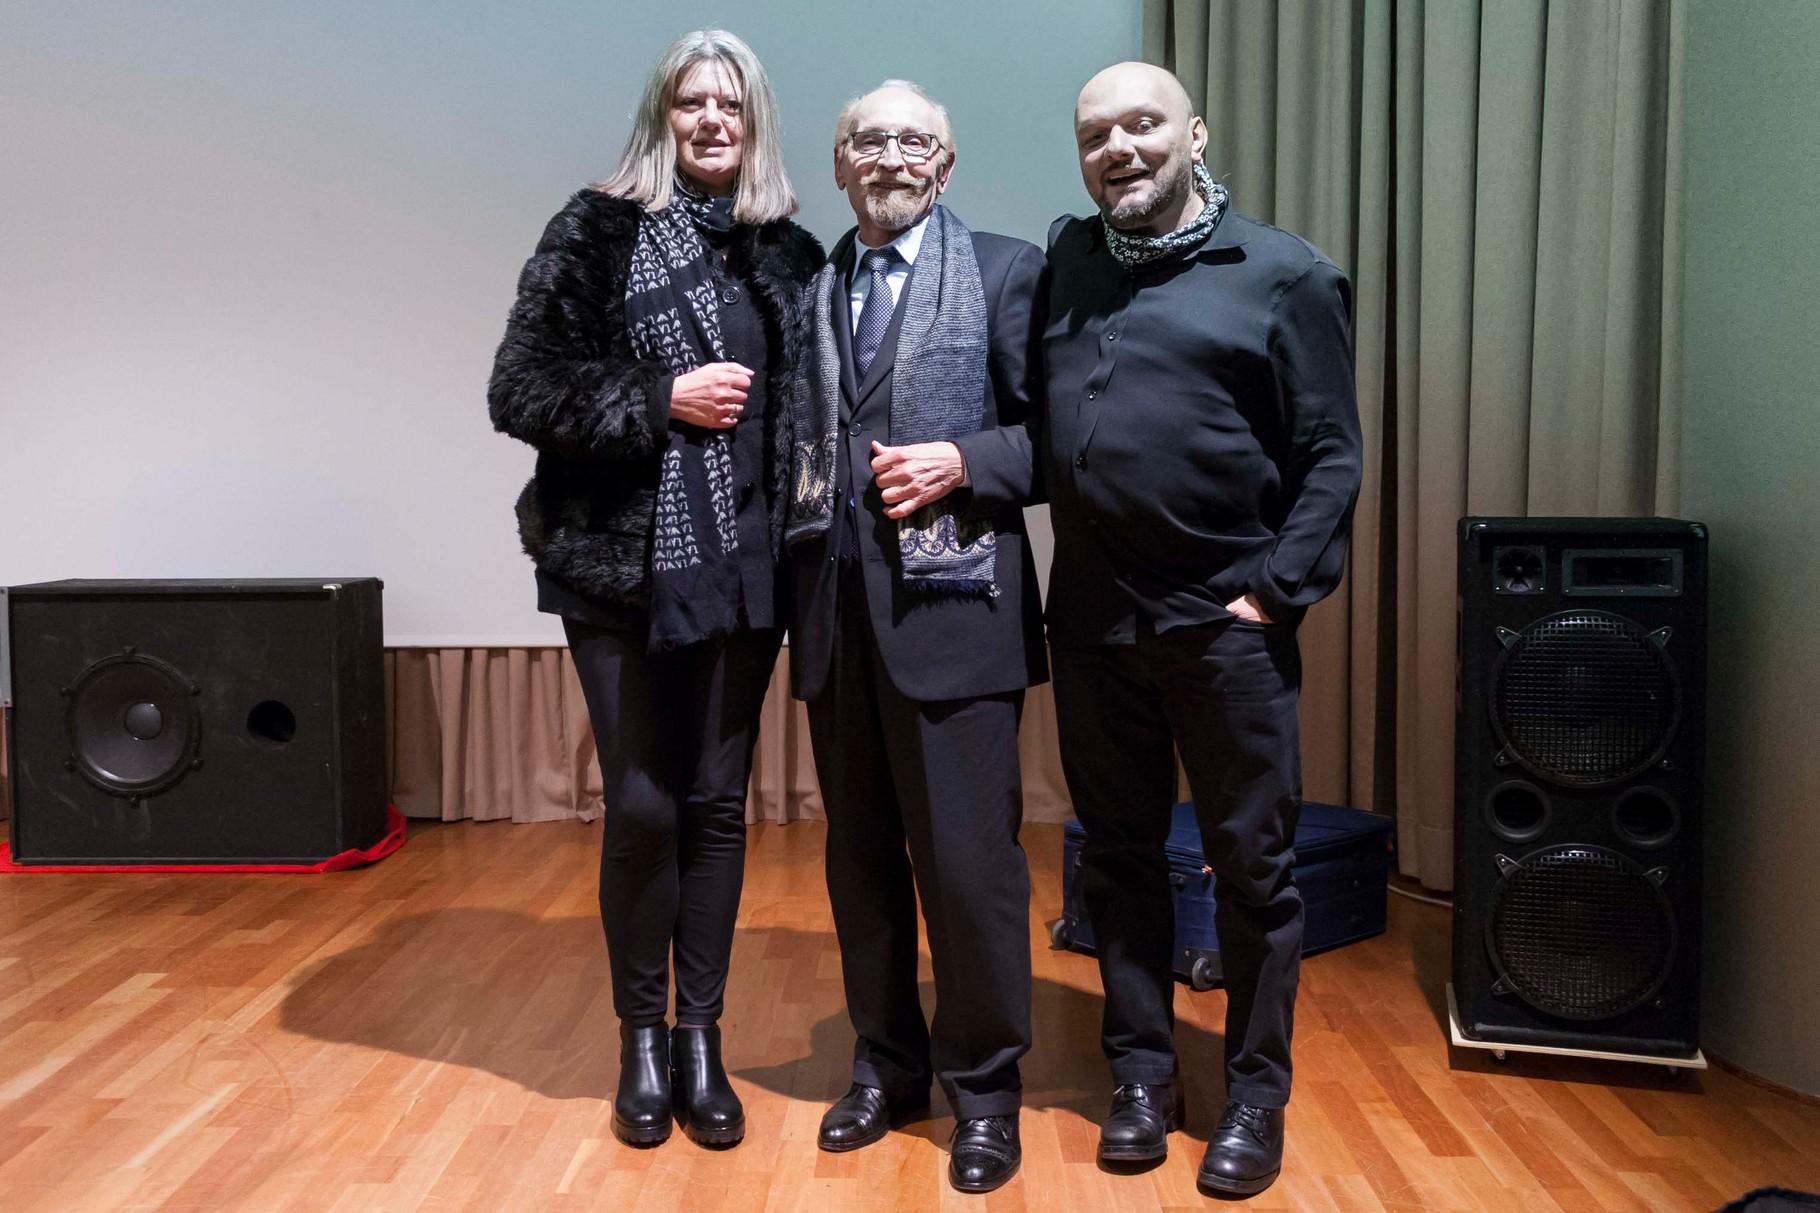 Carolina De Antoni, Bruno Furini, Beppe Frattaroli